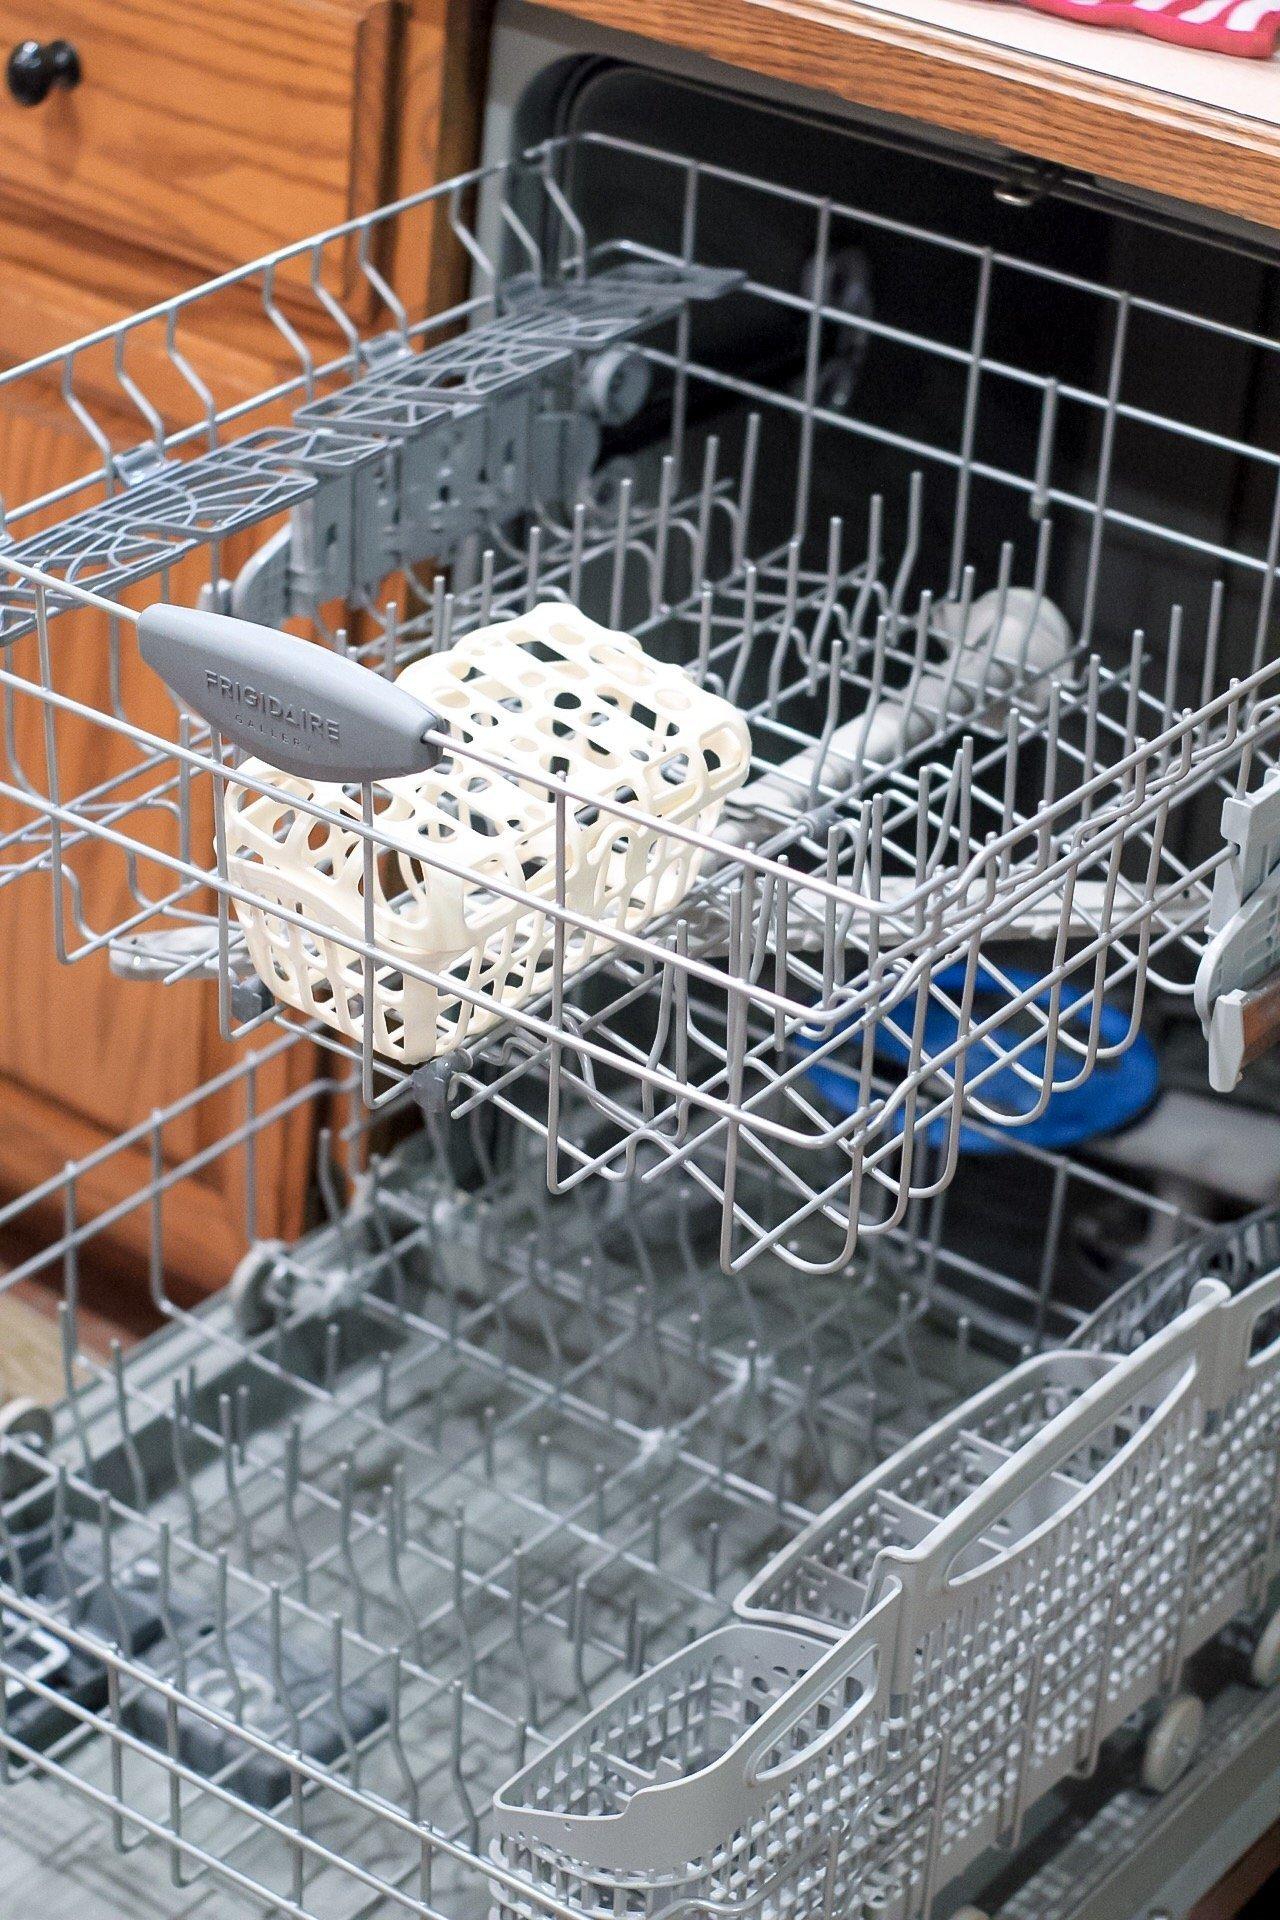 empty dishwasher